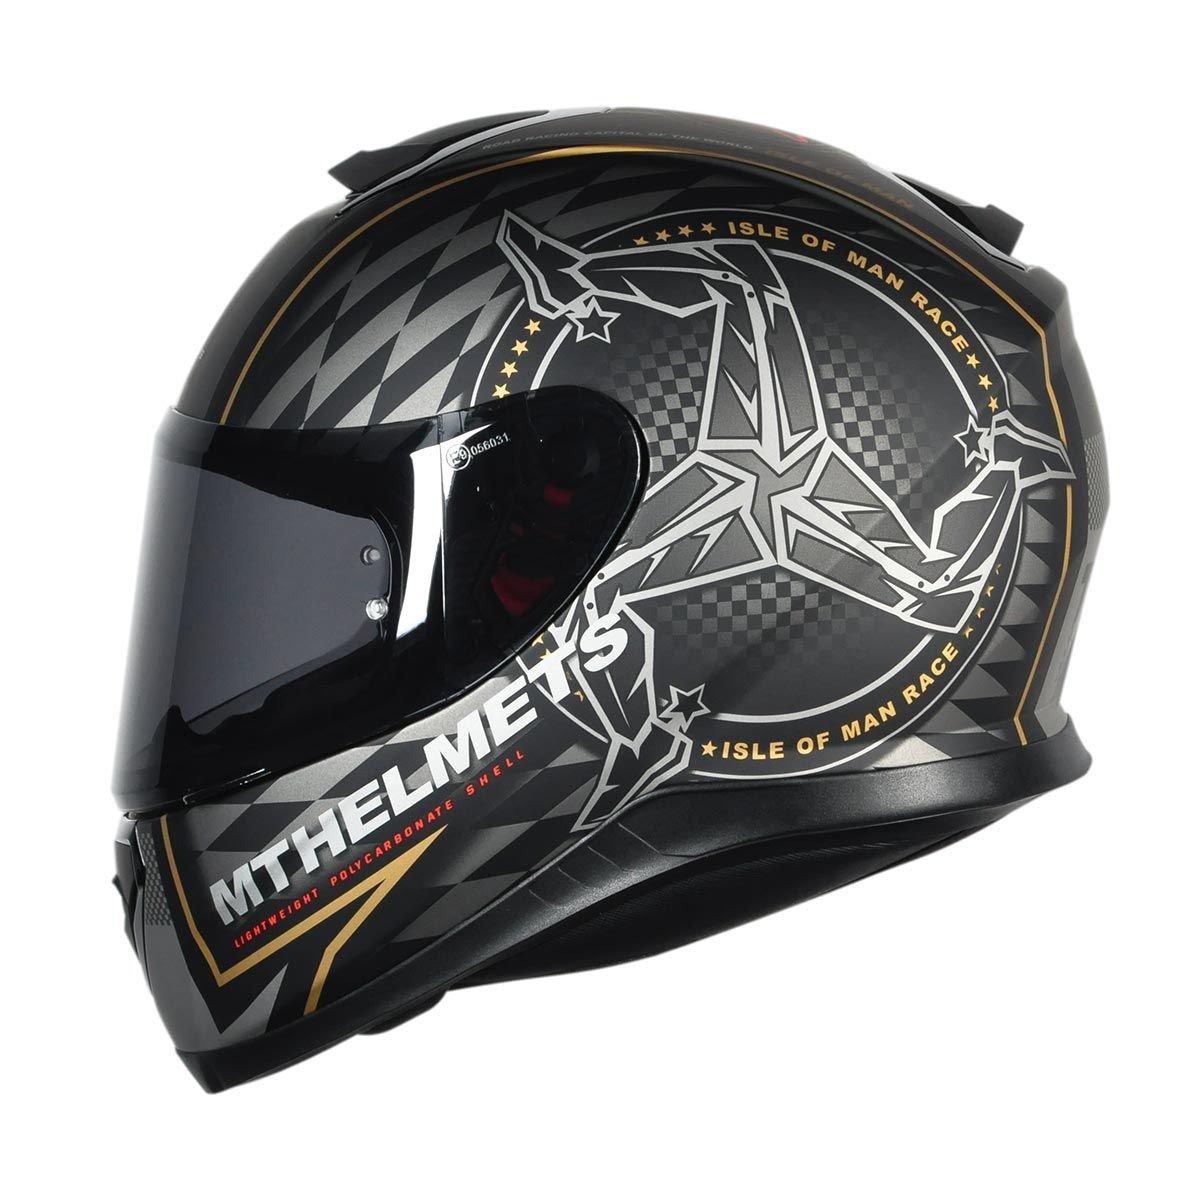 83bb42103 capacete mt helmets thunder 3 isle of man matt black/gold. Carregando zoom.